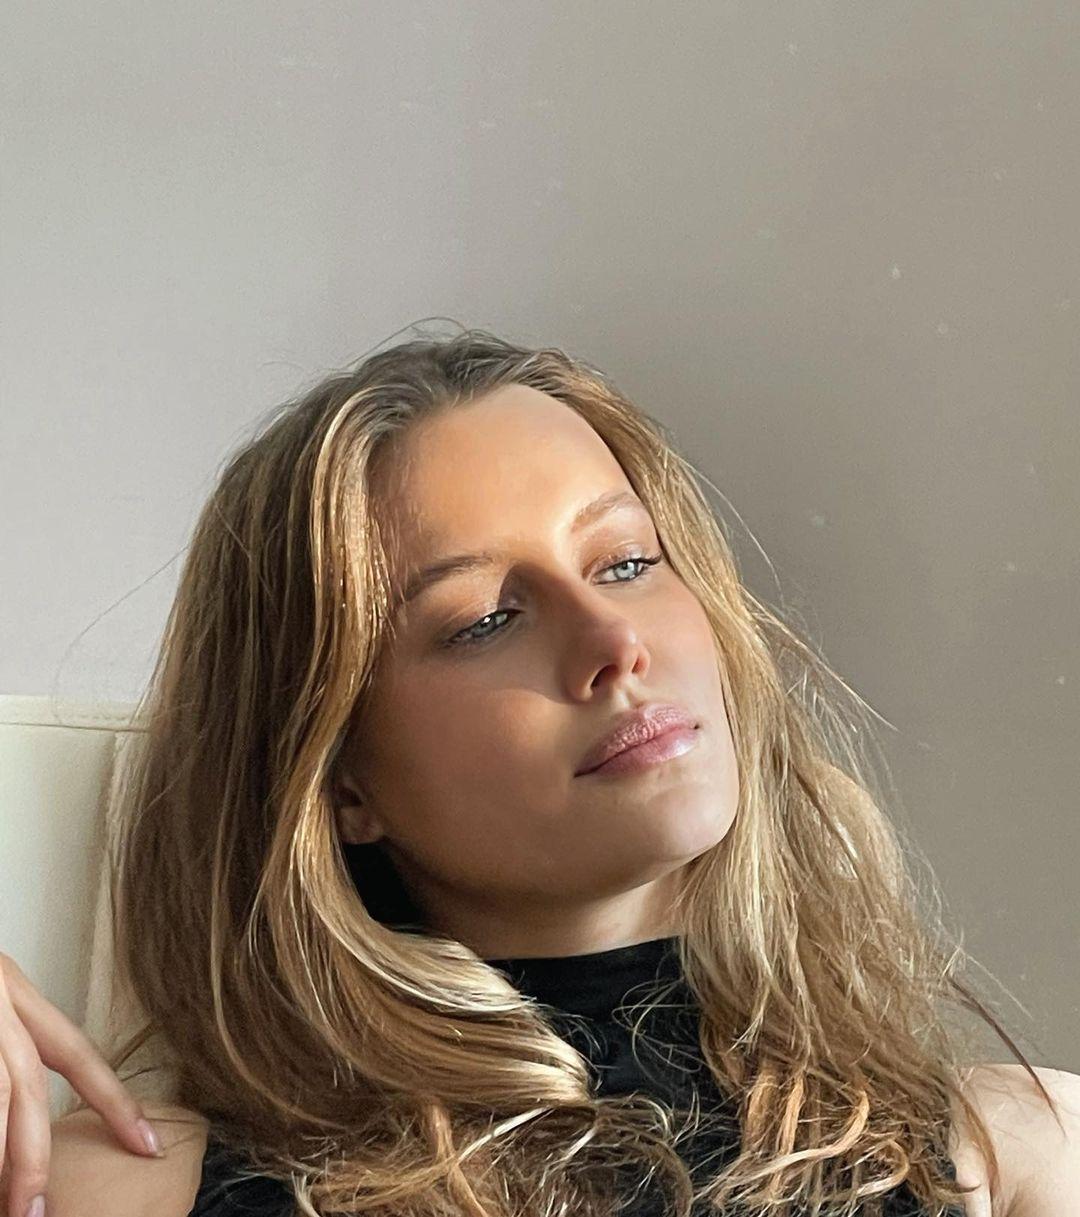 Nicole-Poturalski-Wallpapers-Insta-Fit-Bio-5